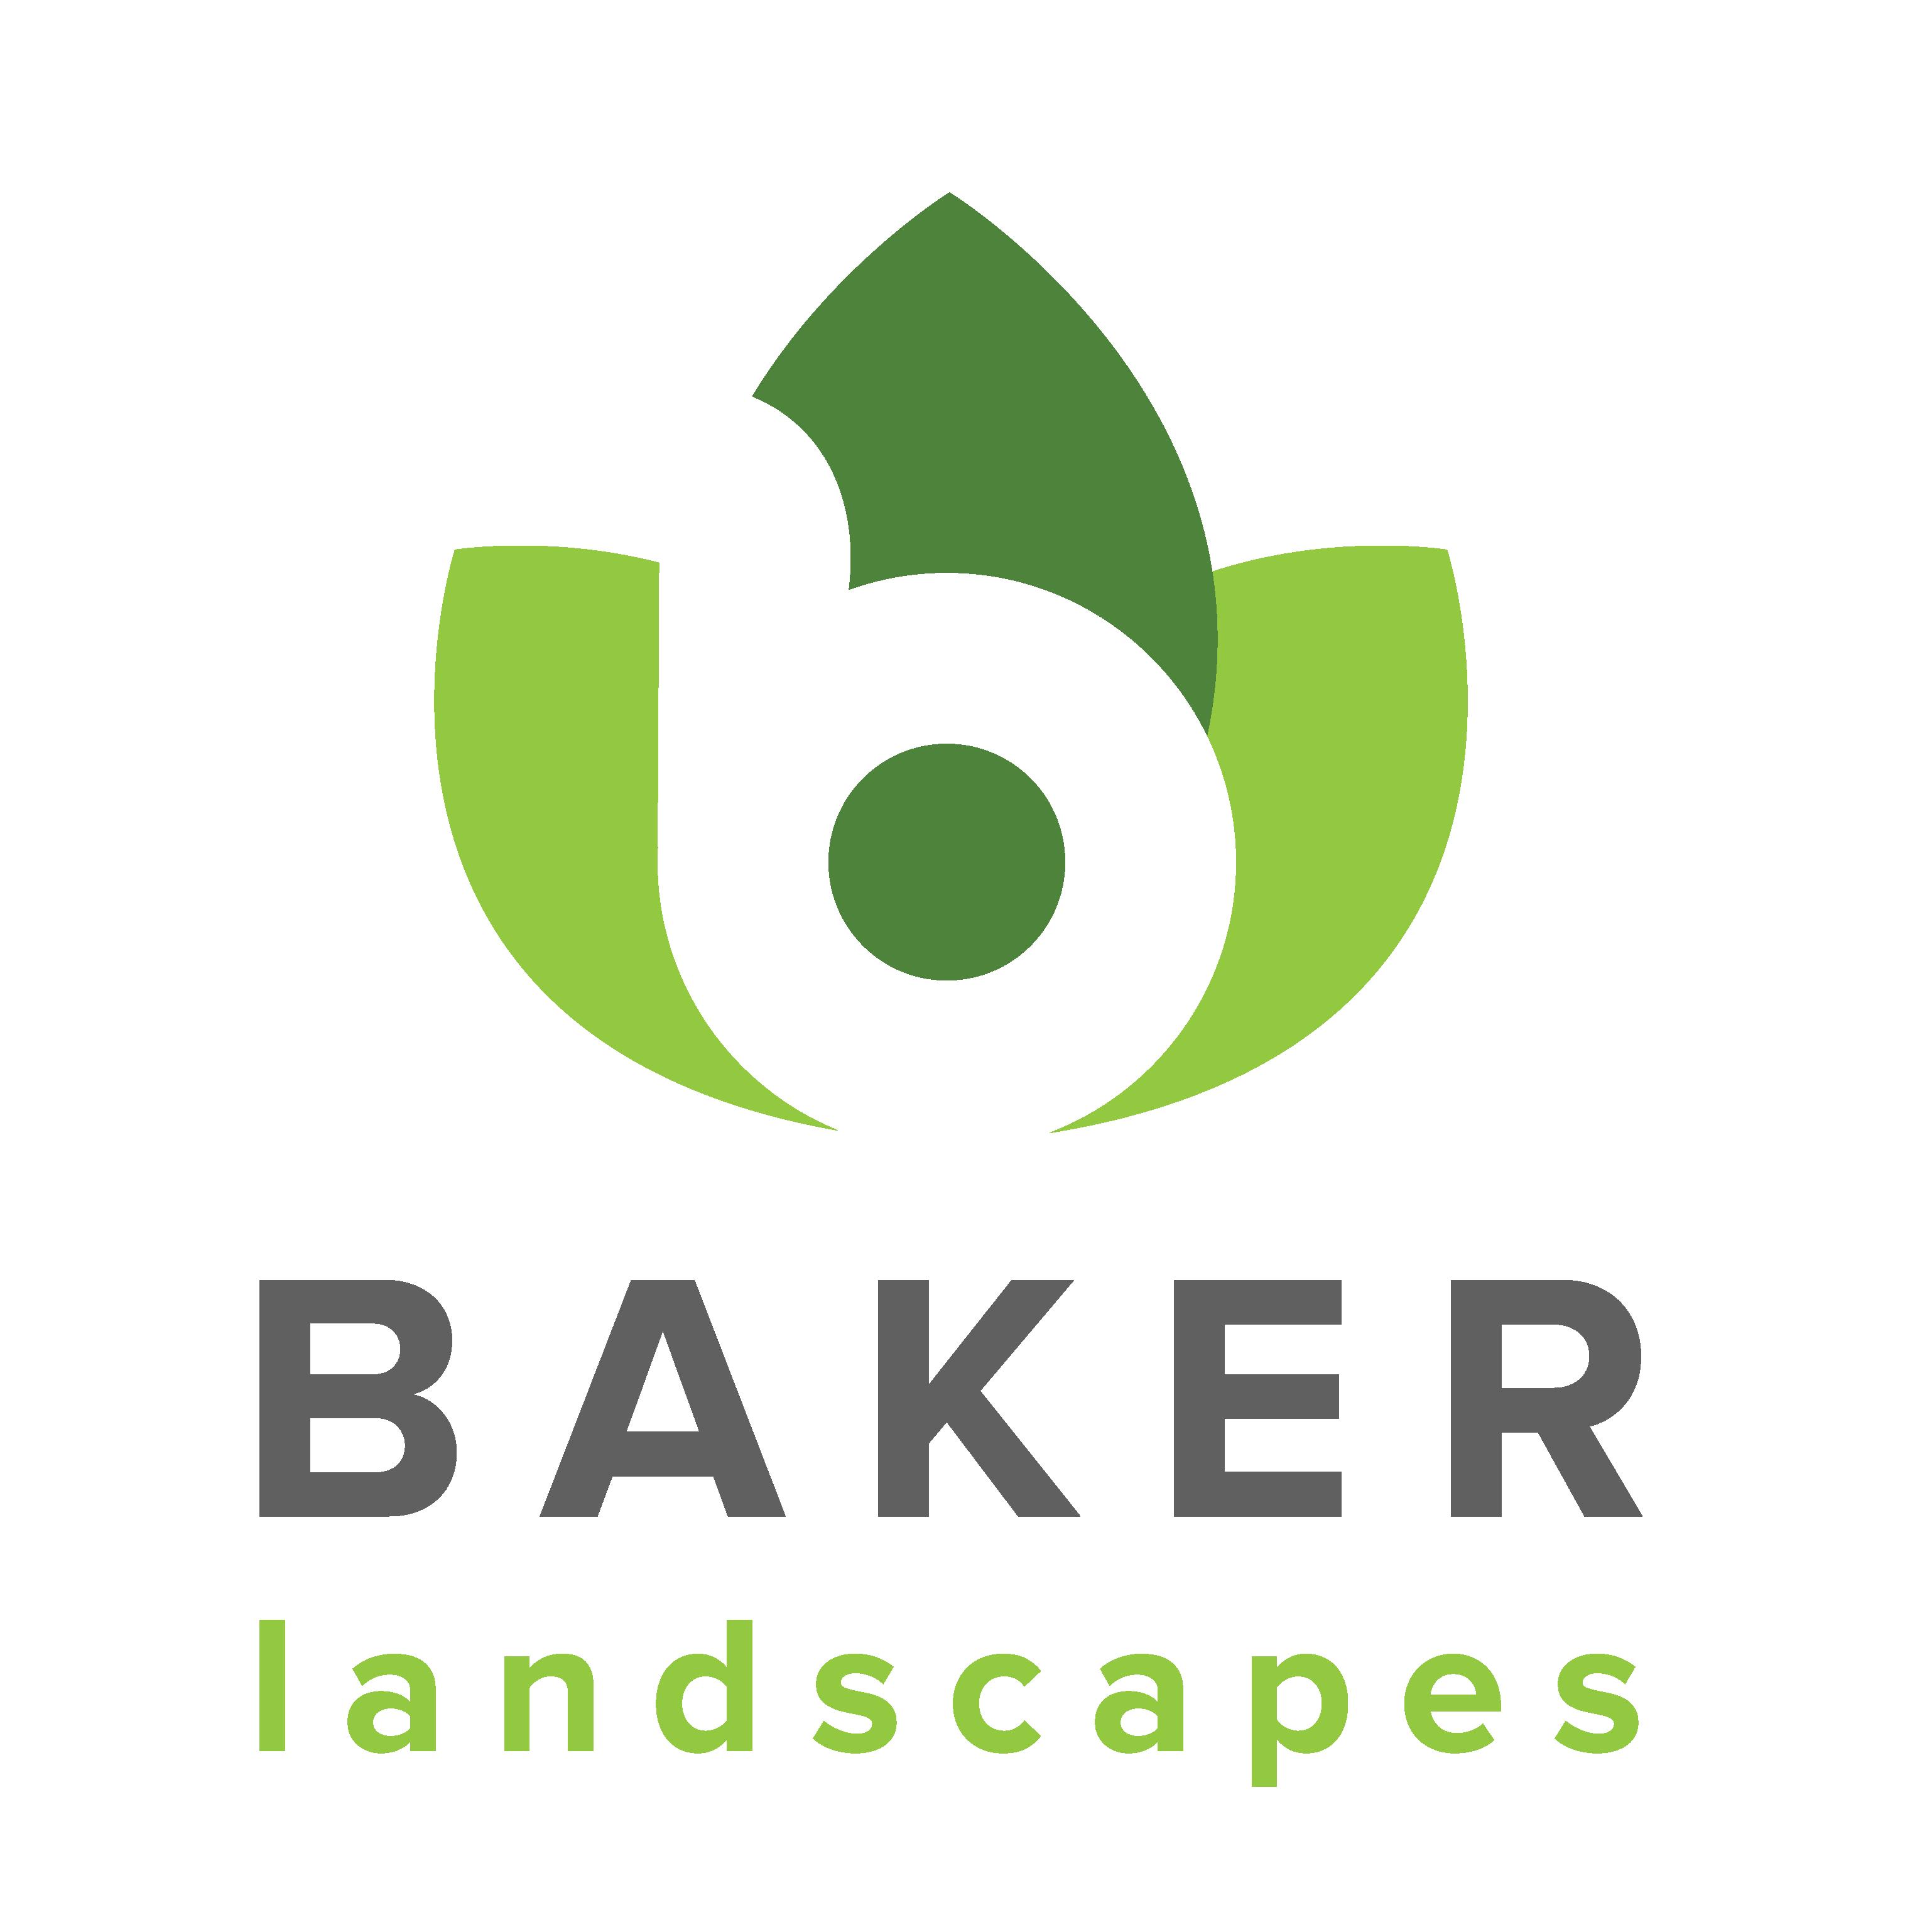 Baker Landscapes nad Lawn Vertical - Erica Zoller Creative